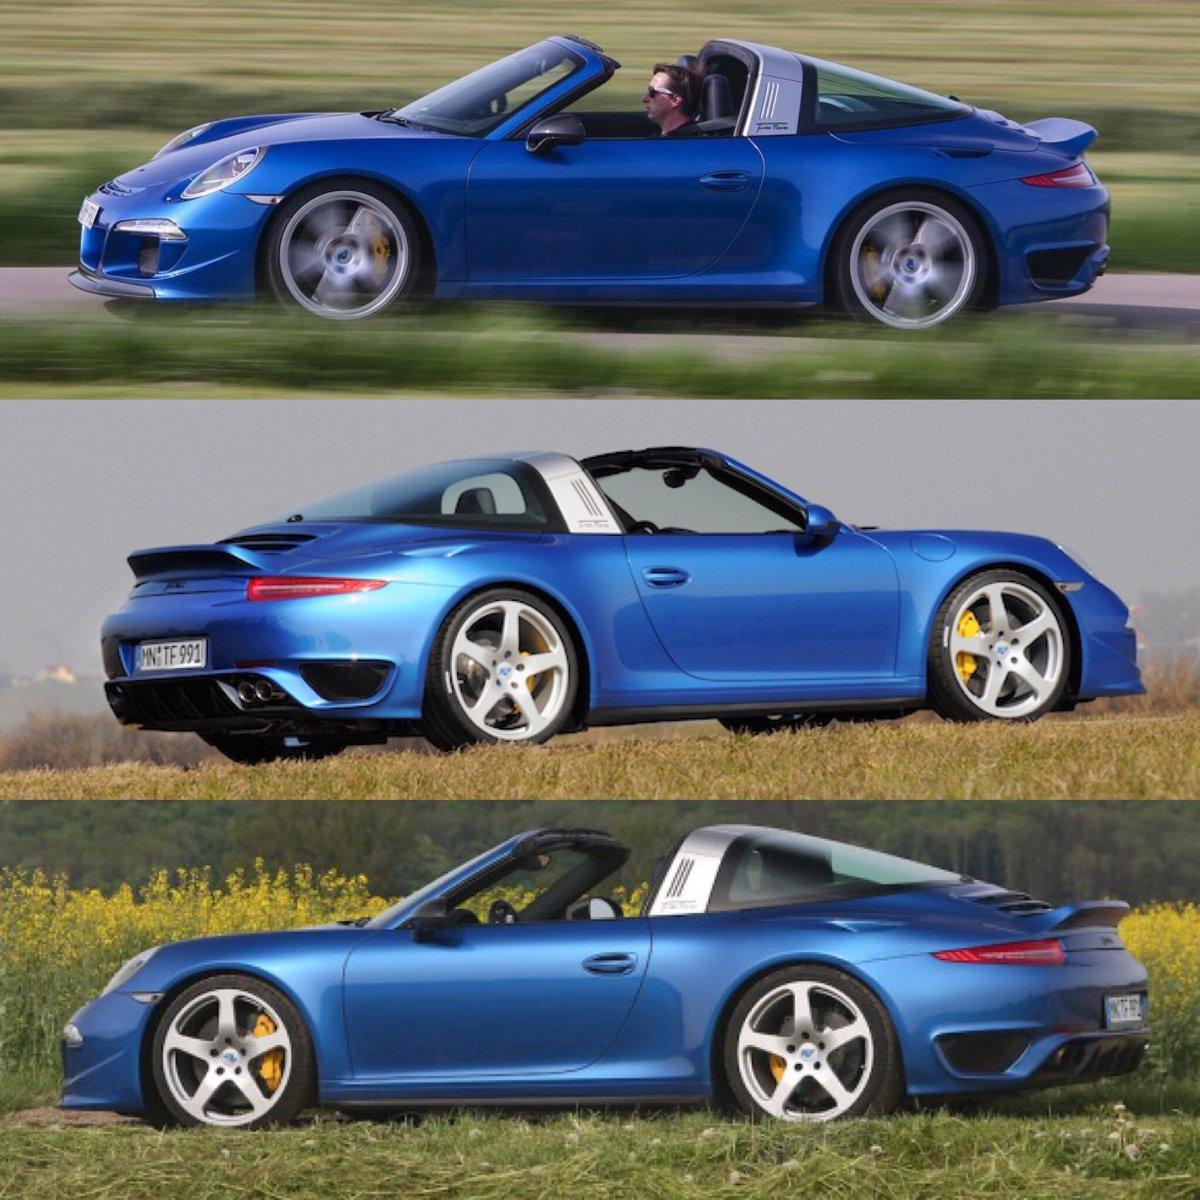 Alain Kerkhofs On Twitter The Ruf Porsche 991 Targa With Ducktail Amazing Beauty Perfection Porsche Porschetarga Ruf Targafiorio Porsche911 Targa 991 911 Https T Co Imjfempoyn